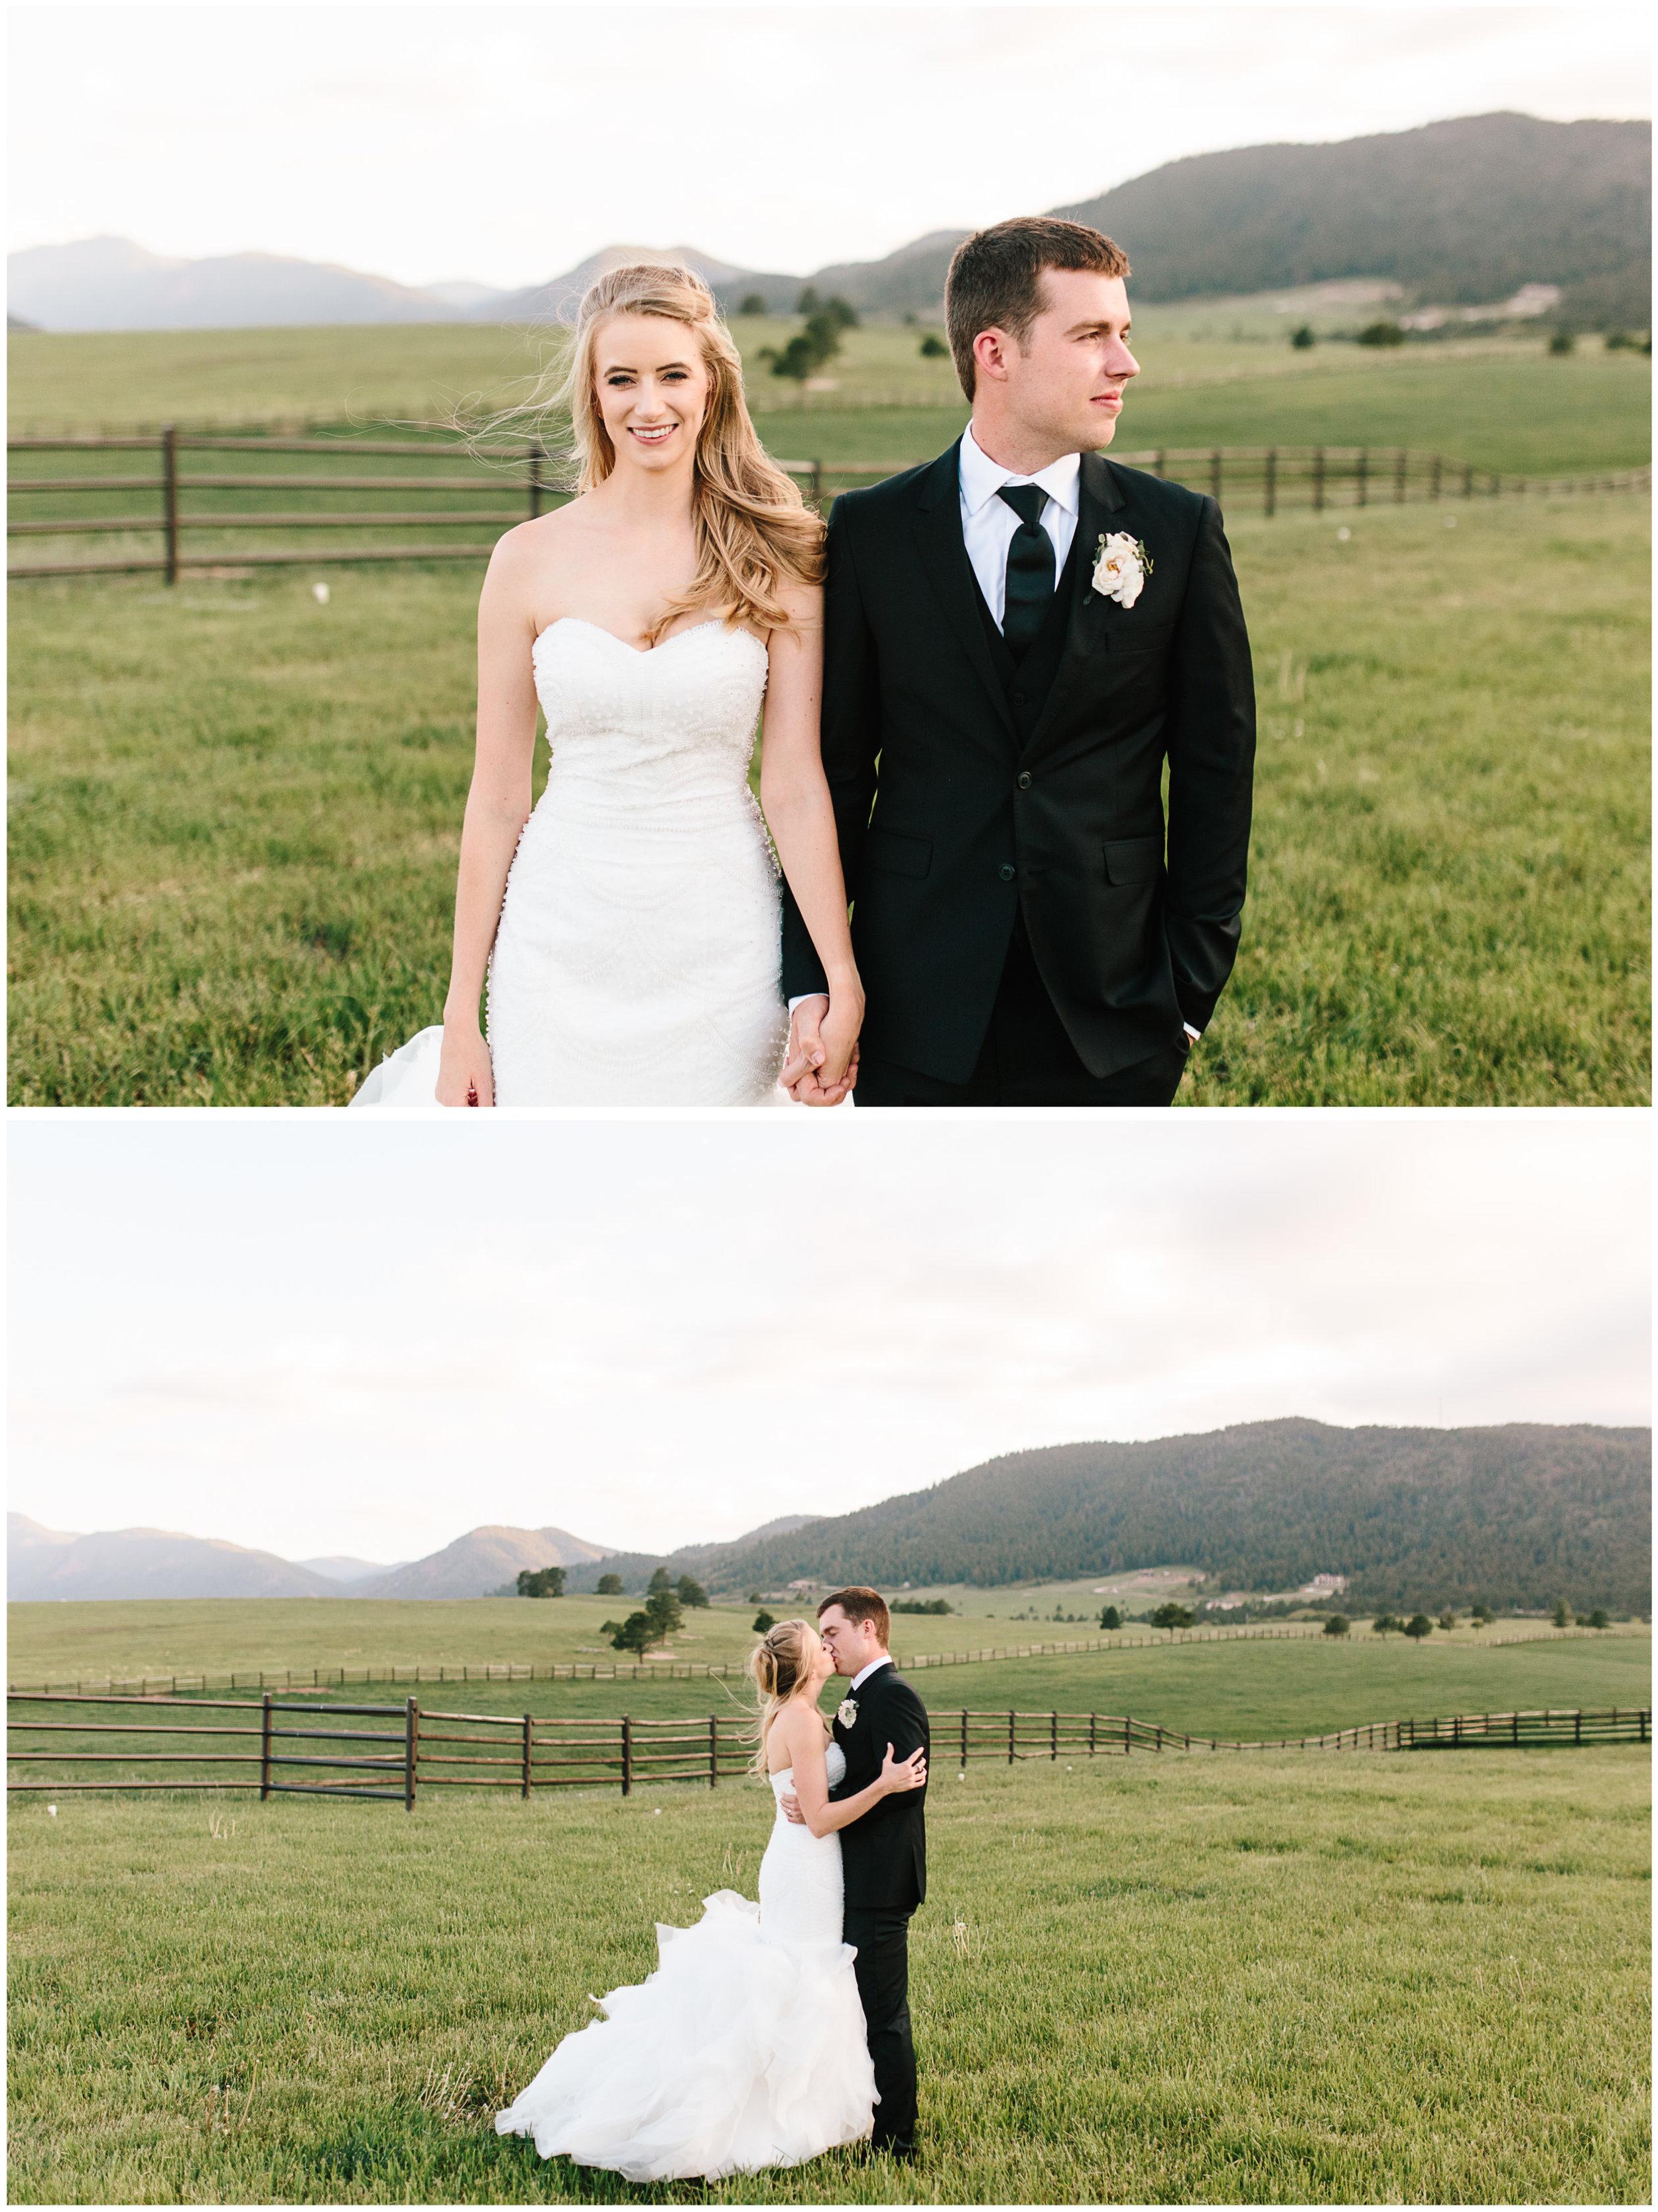 spruce_mountain_ranch_wedding_59.jpg